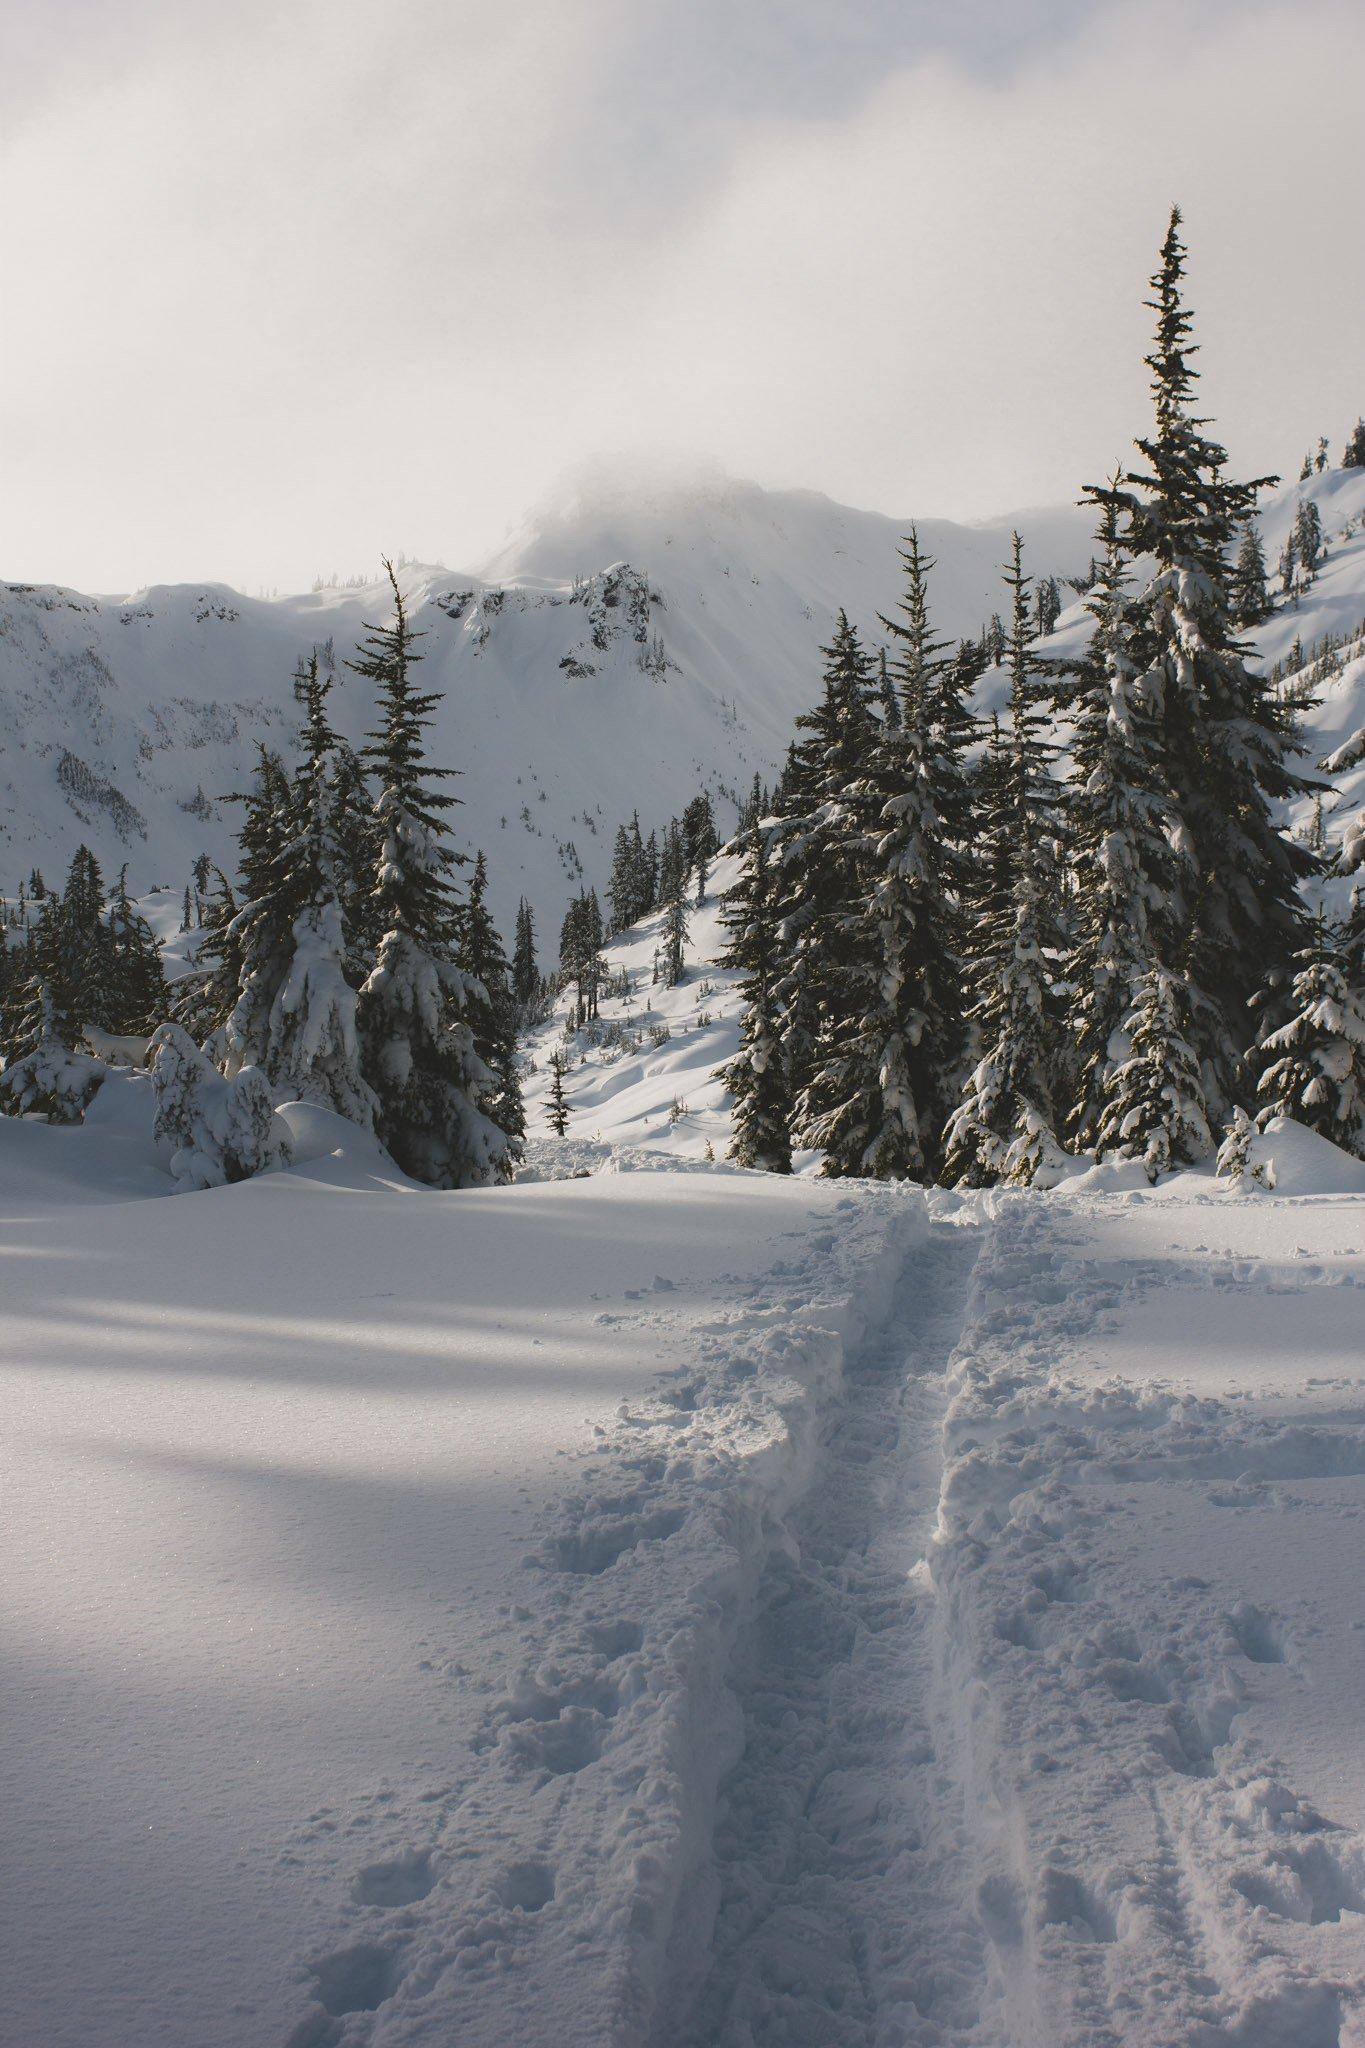 Winter has begun at Mount Baker ski area